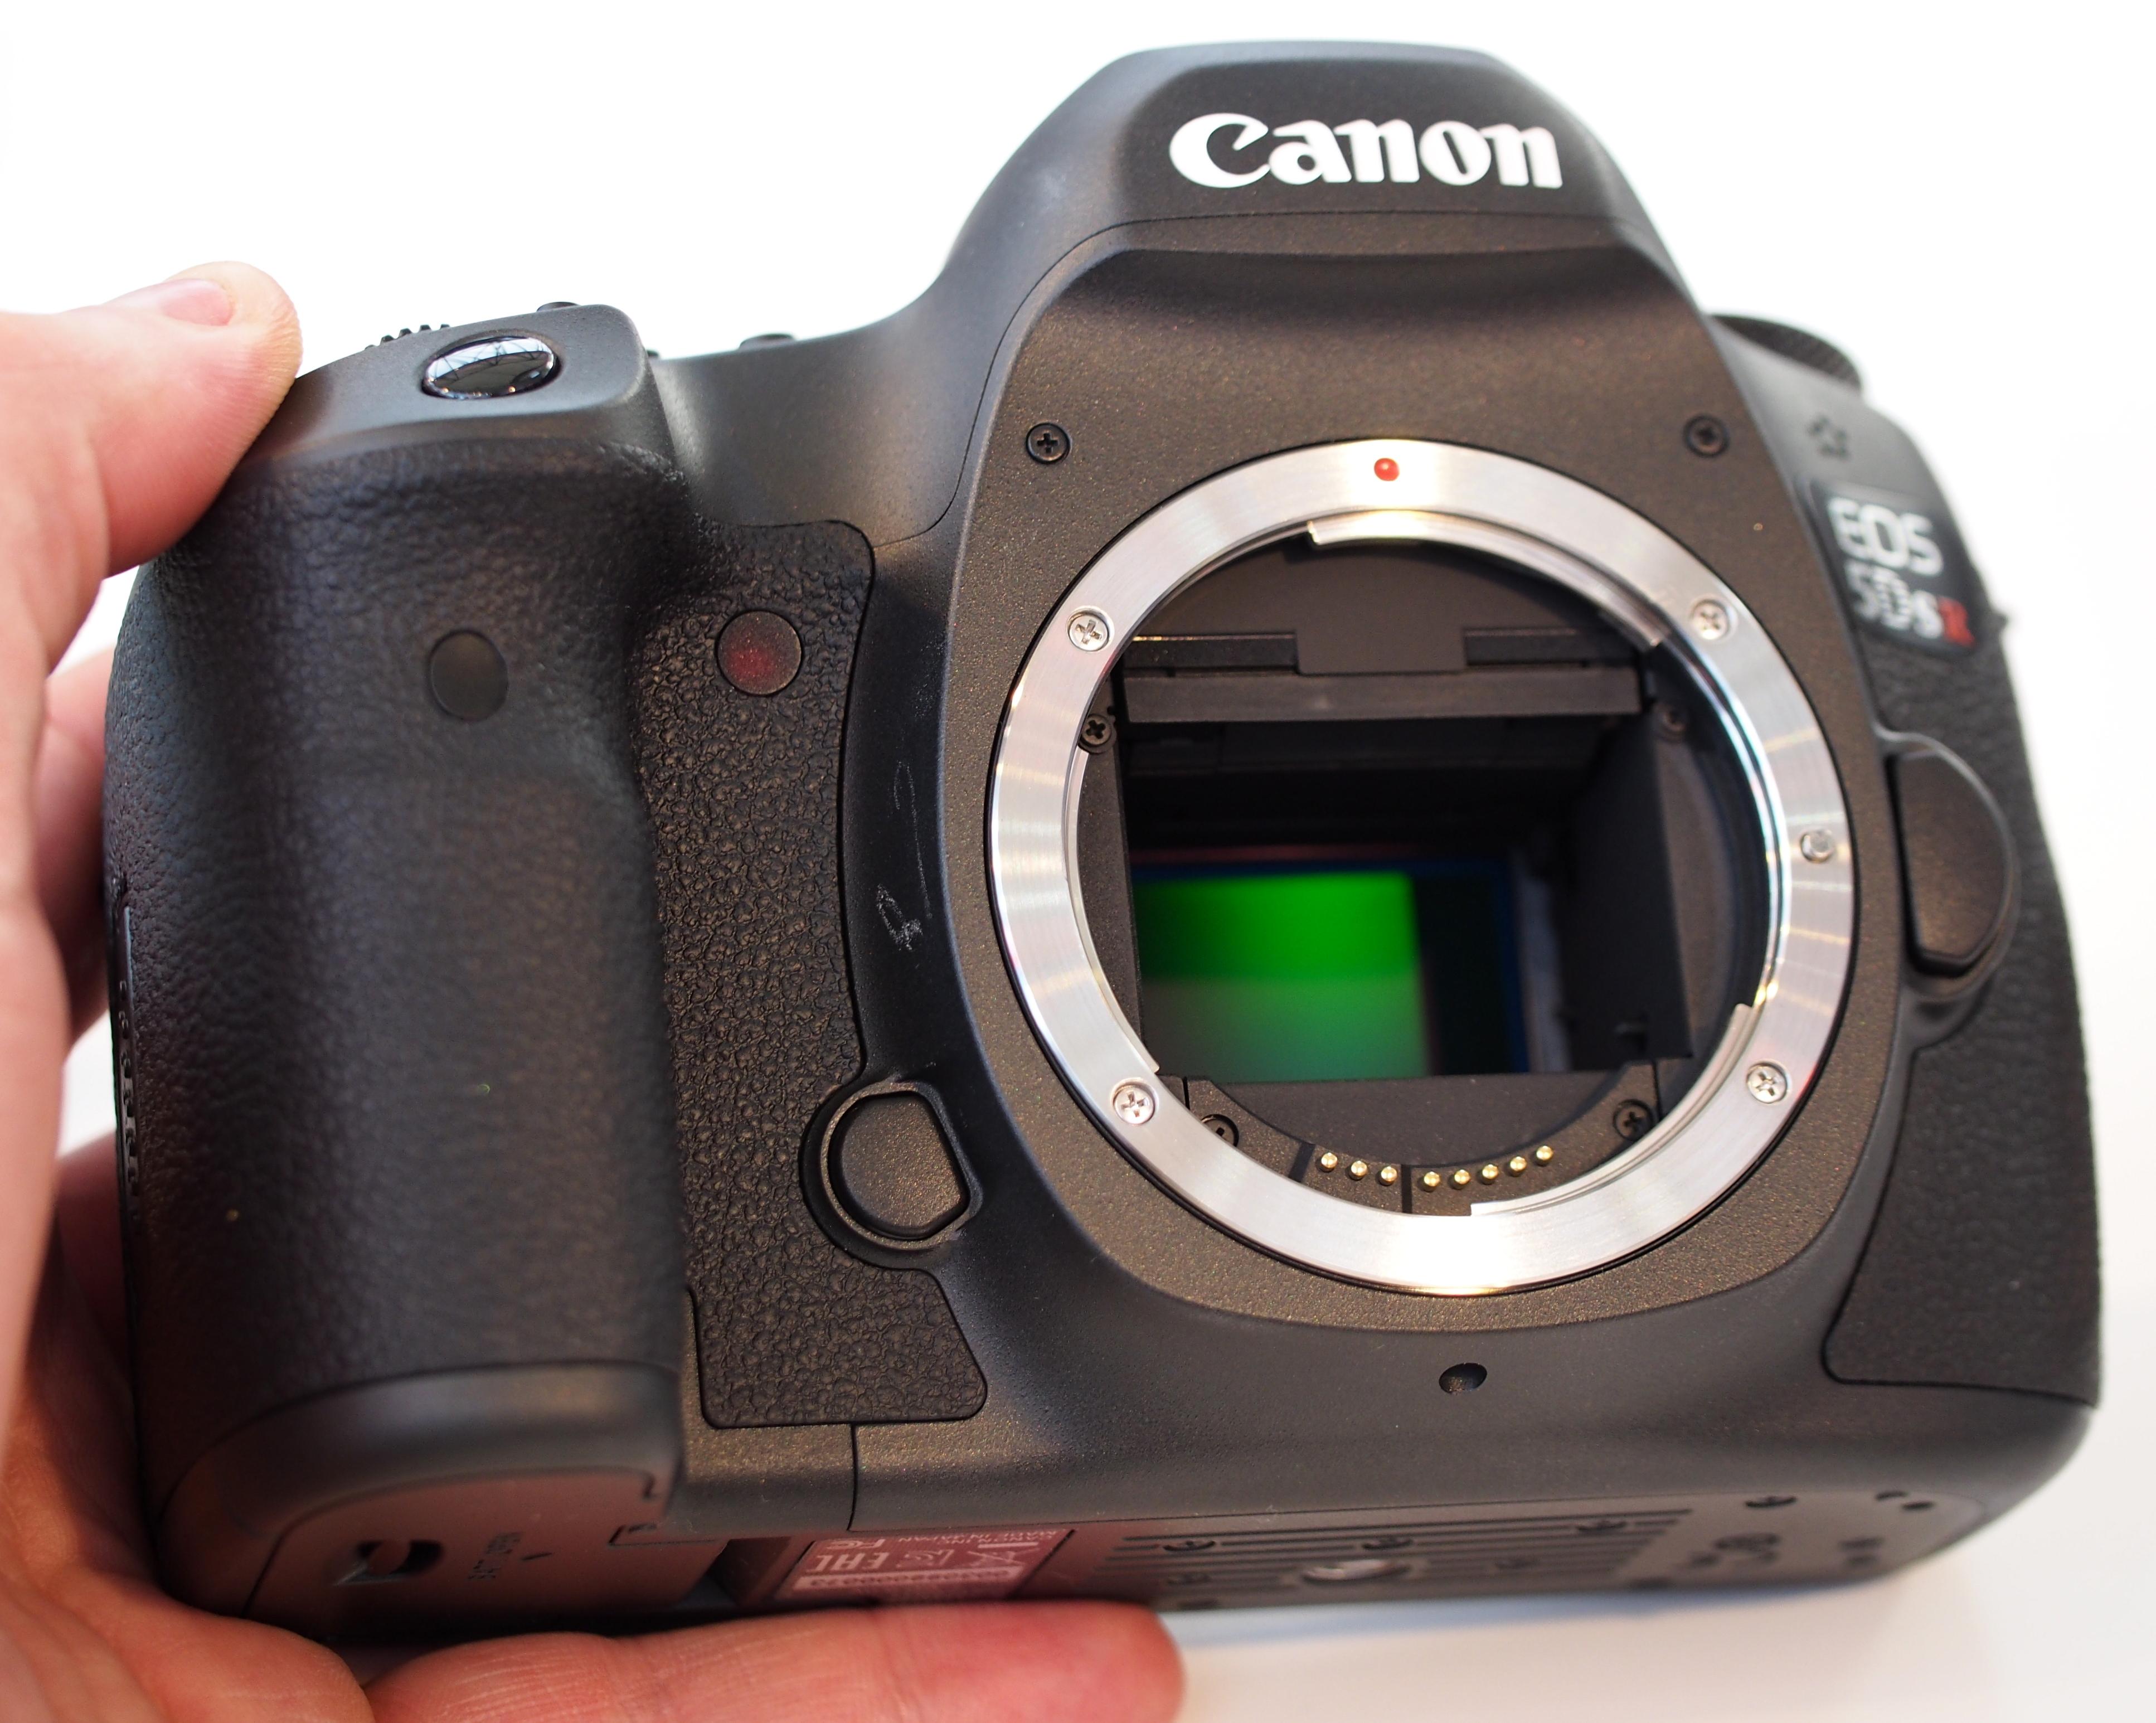 Canon Eos 5ds 5ds R Hands On Sample Photos Ephotozine